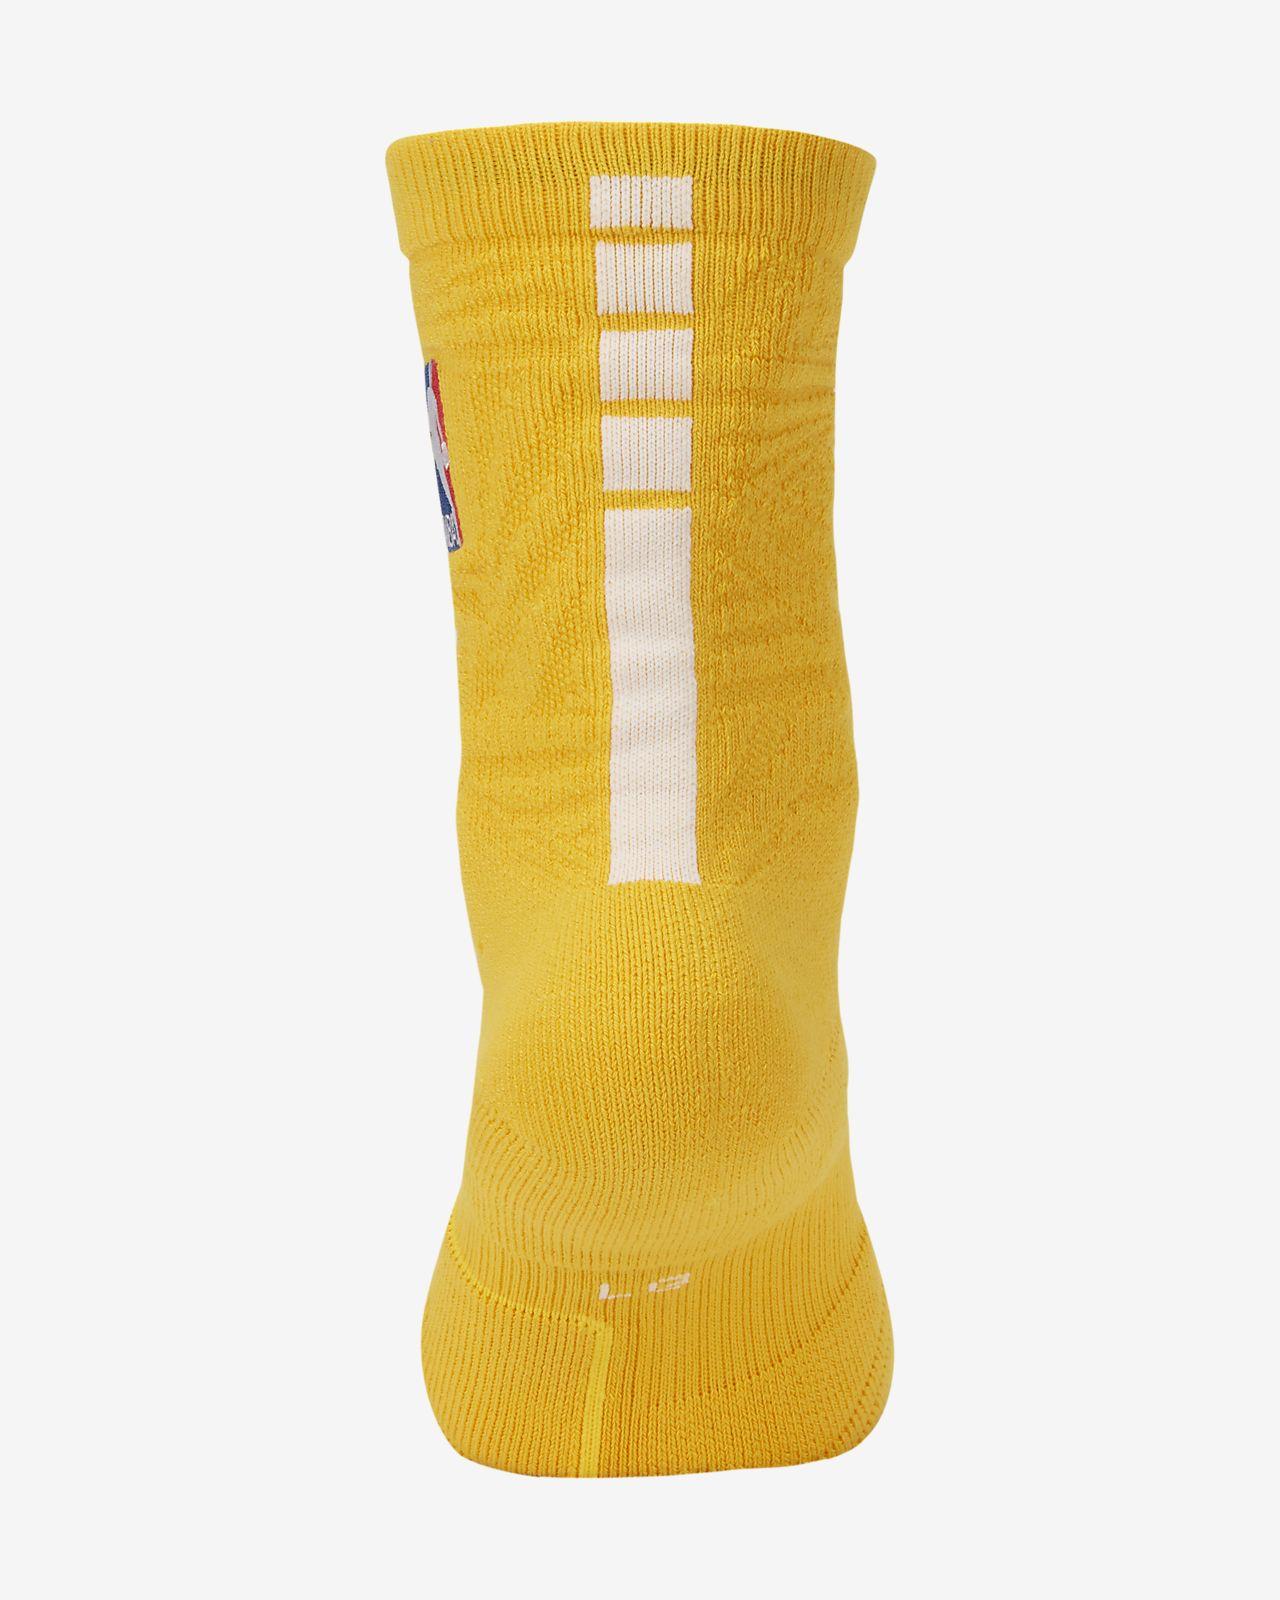 Lakers City Edition Nike Elite NBA Crew Socks